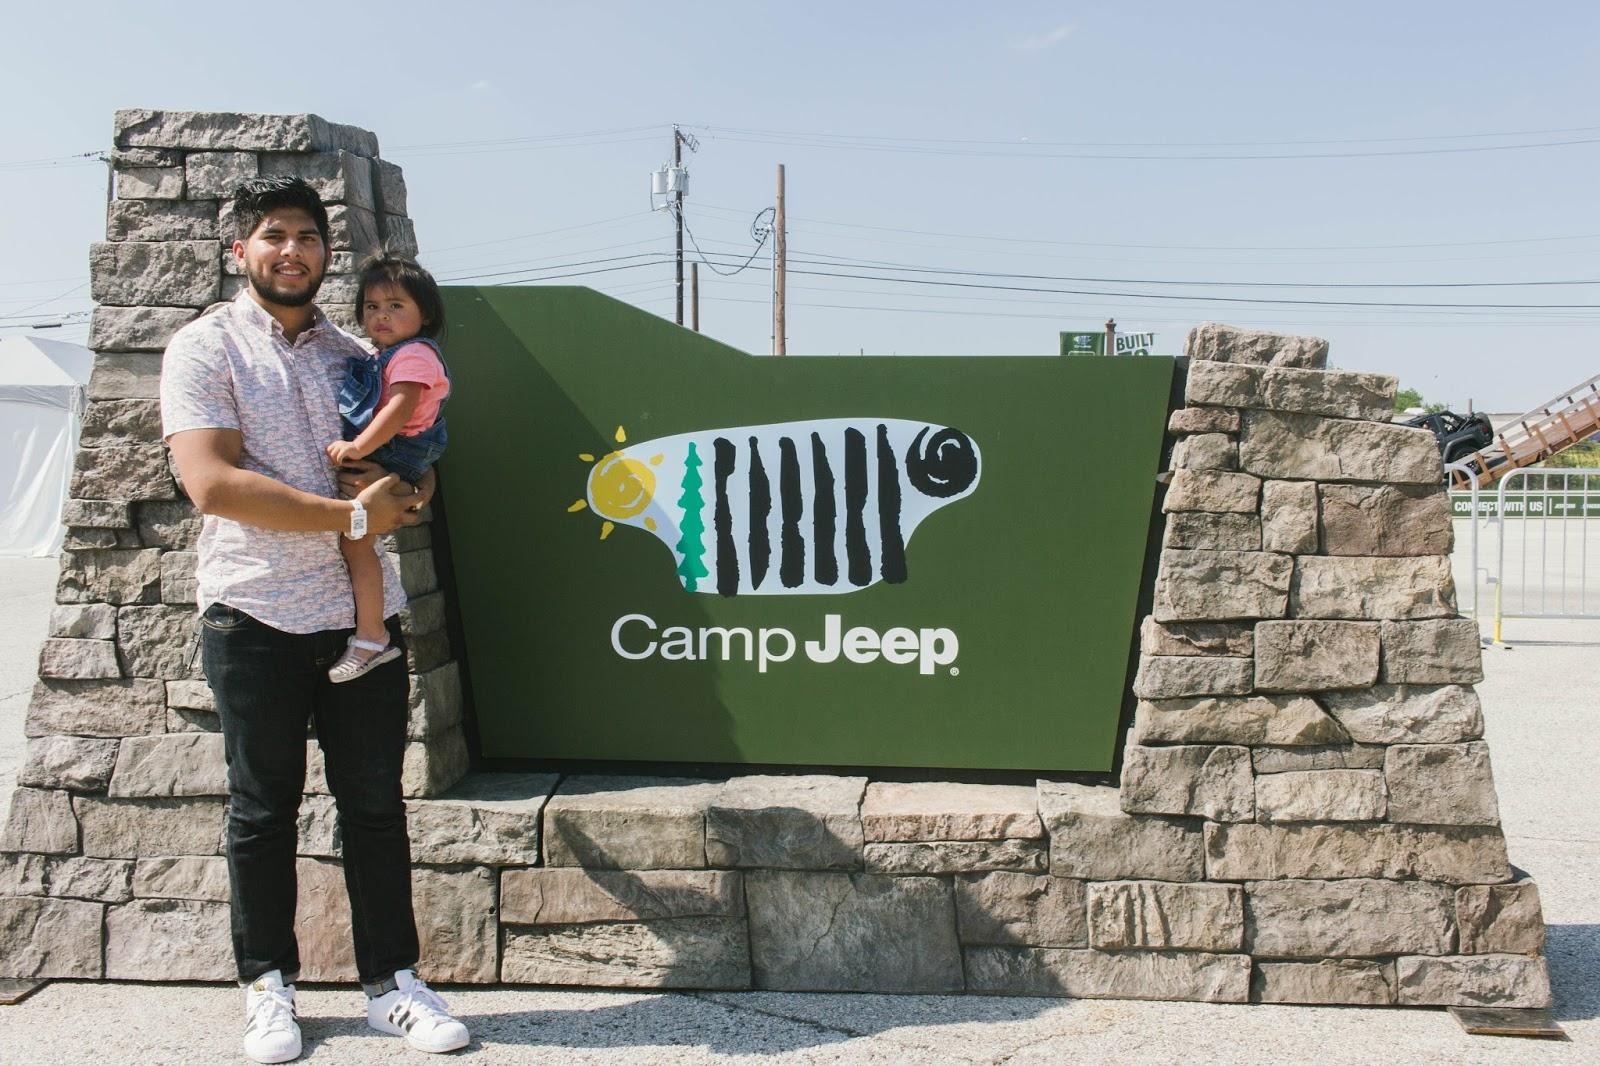 Camp Jeep